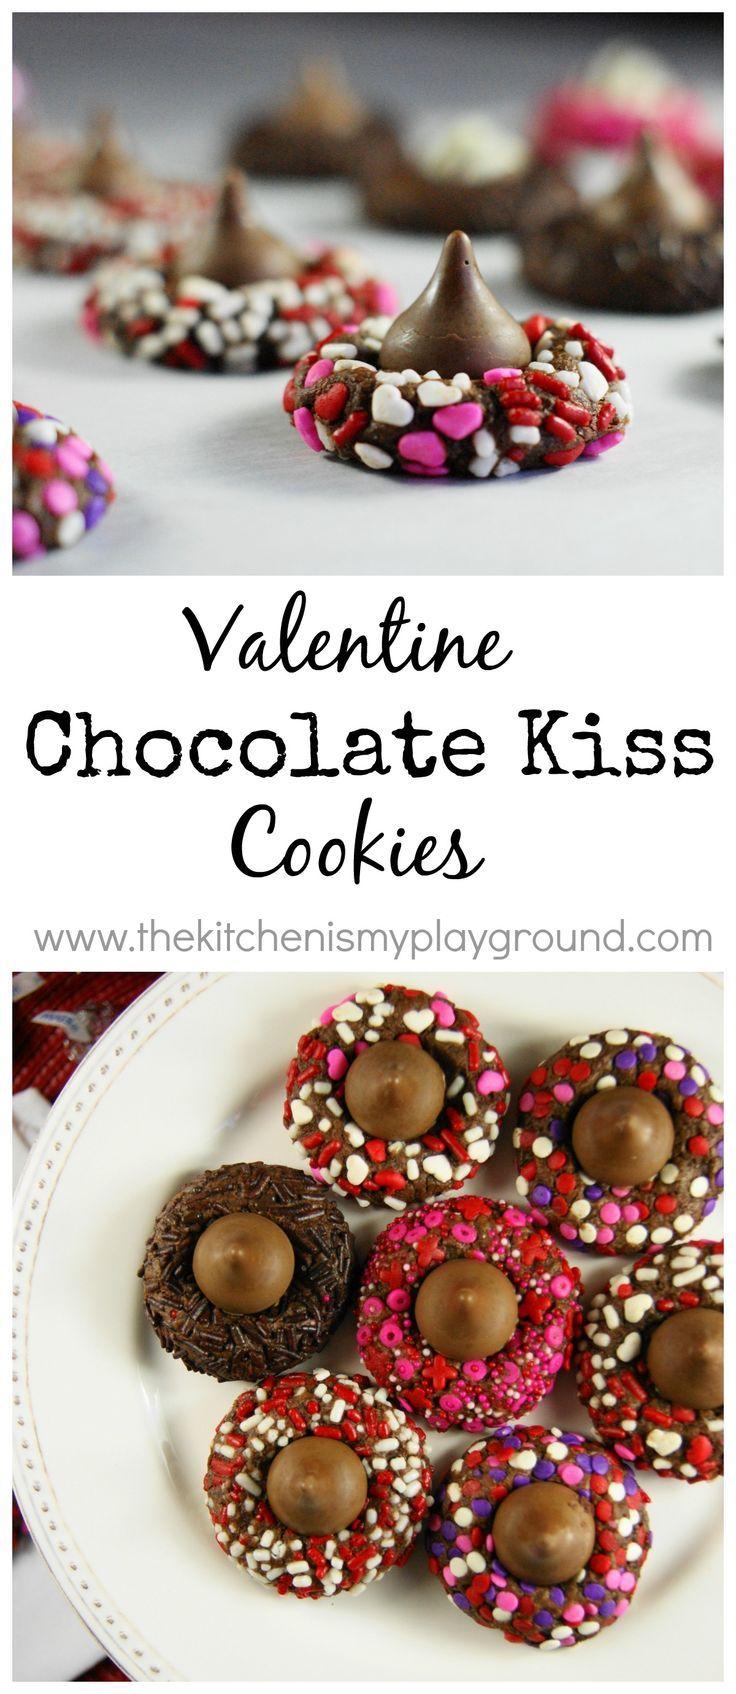 Chocolate Valentine Kiss Cookies ... such a pretty Valentine sweet treat! www.thekitchenismyplayground.com